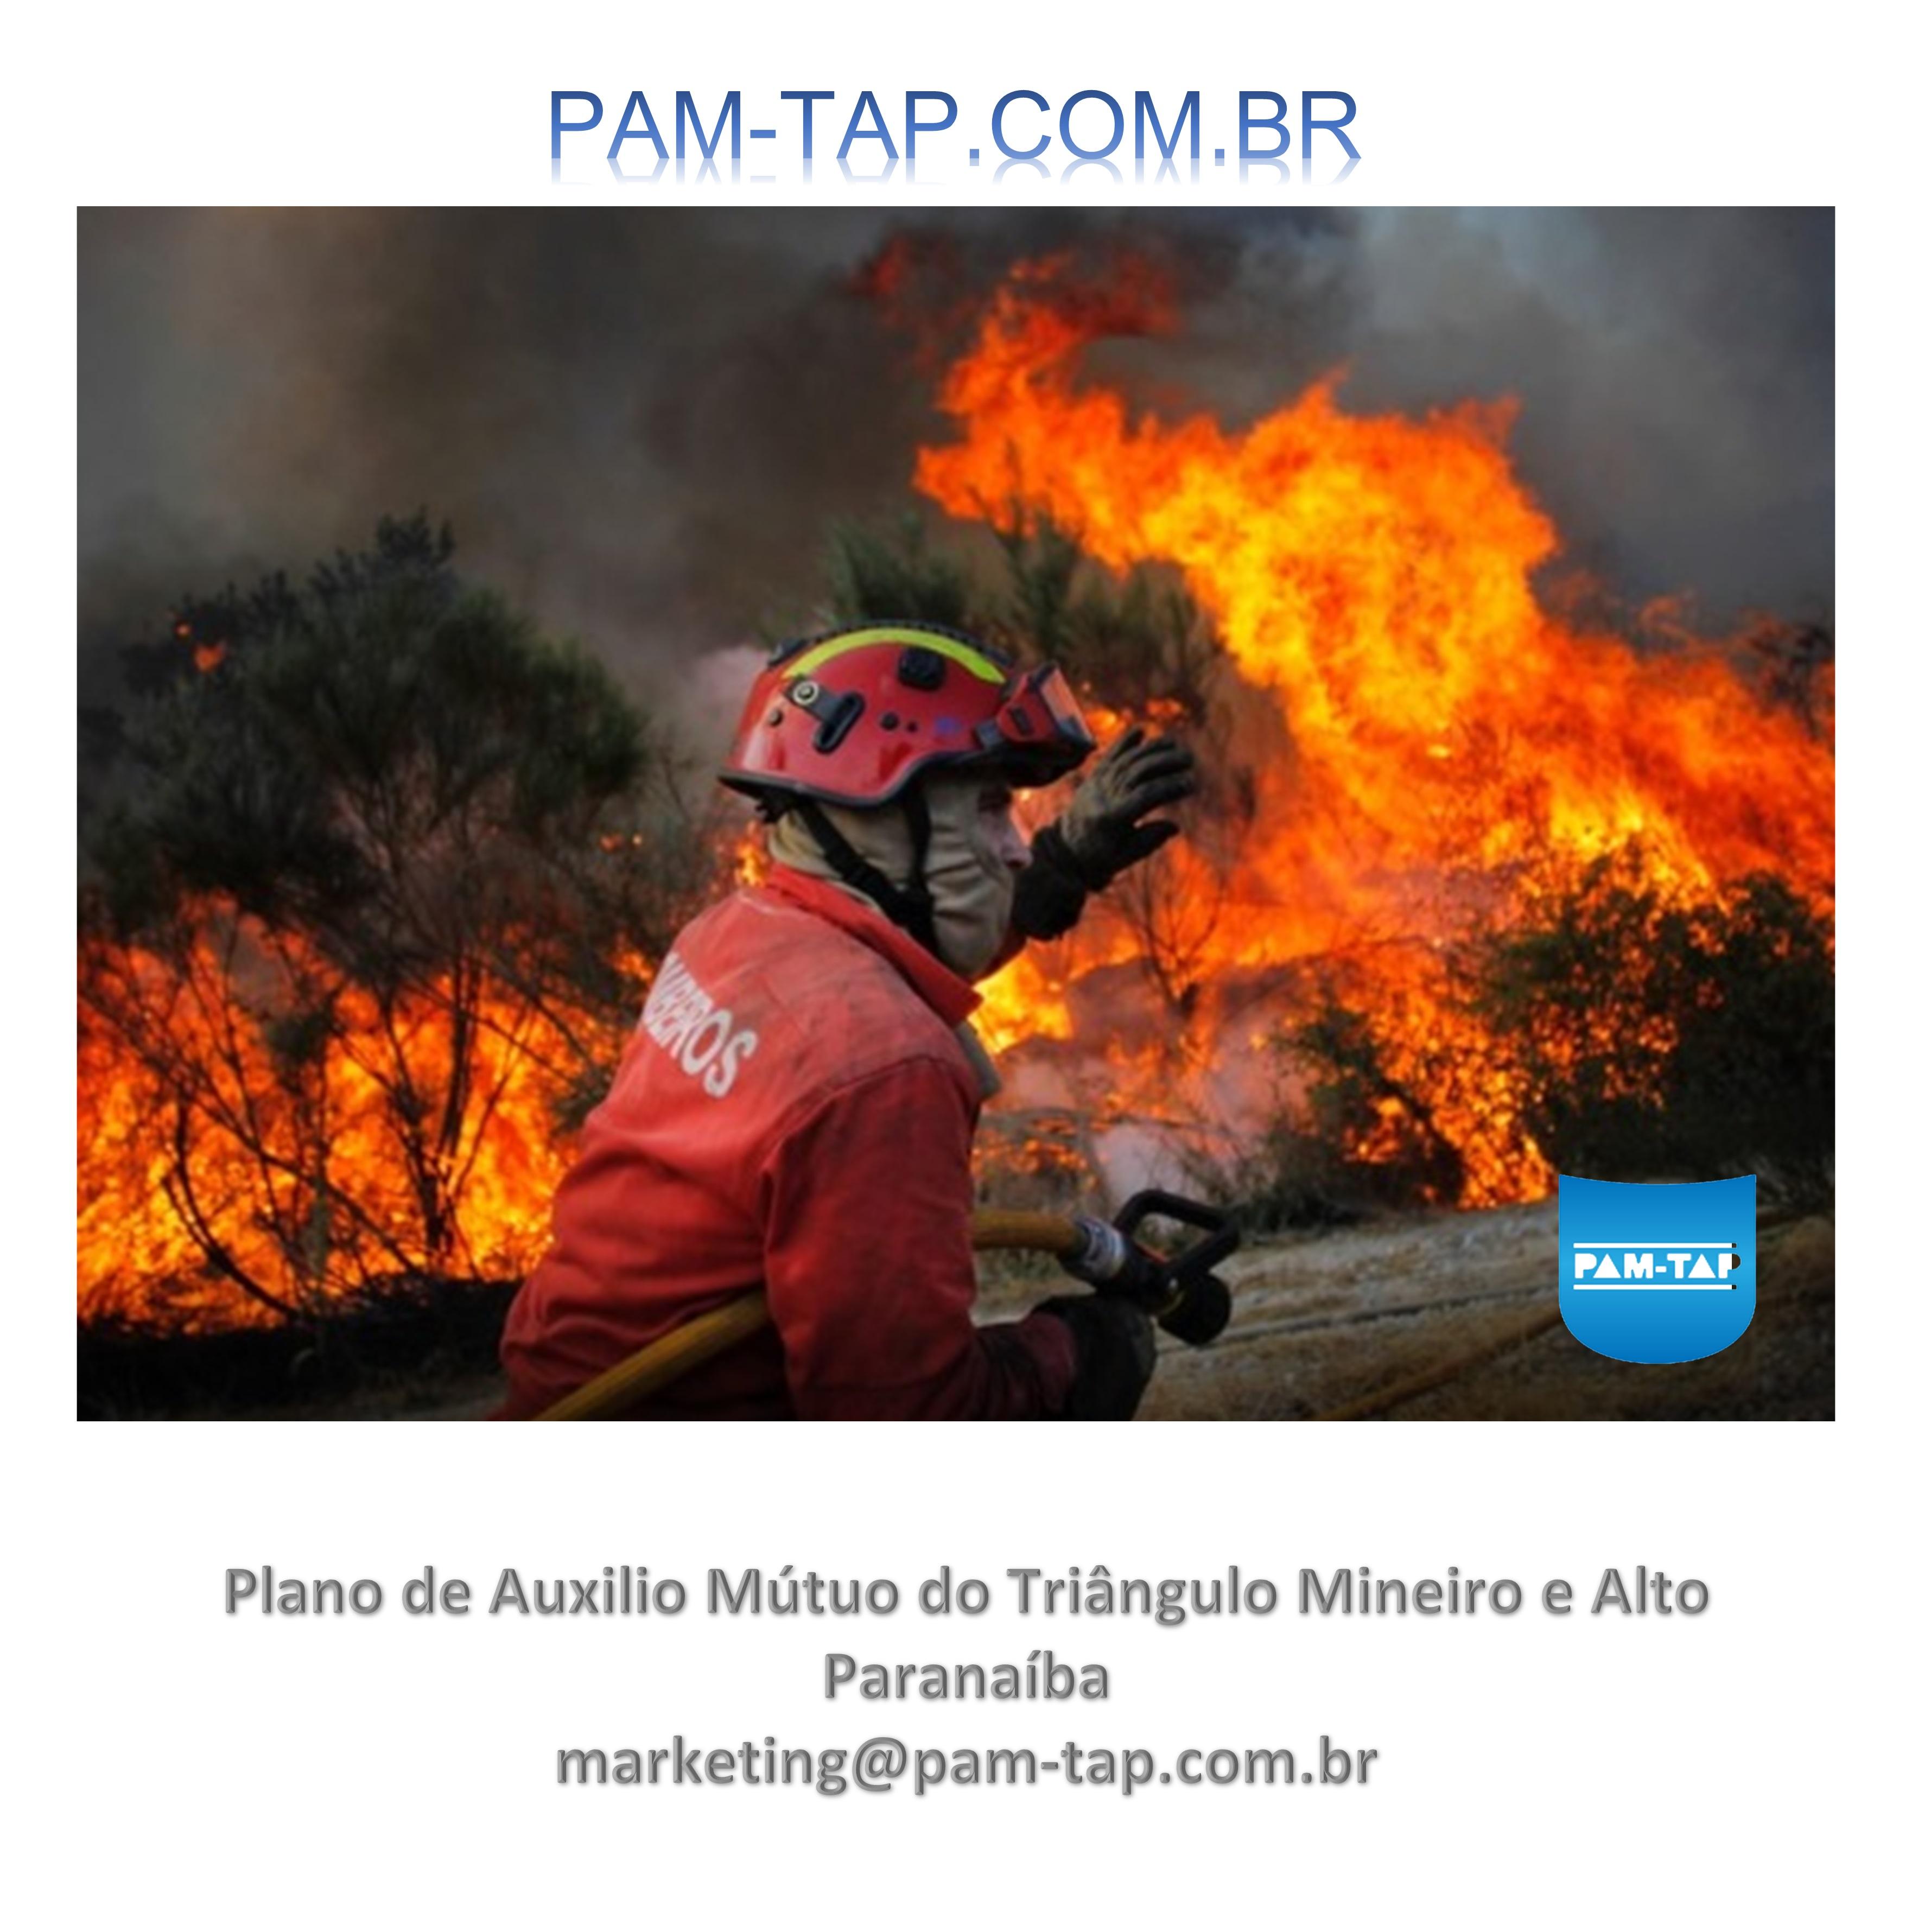 PAM-TAP Campanhas b